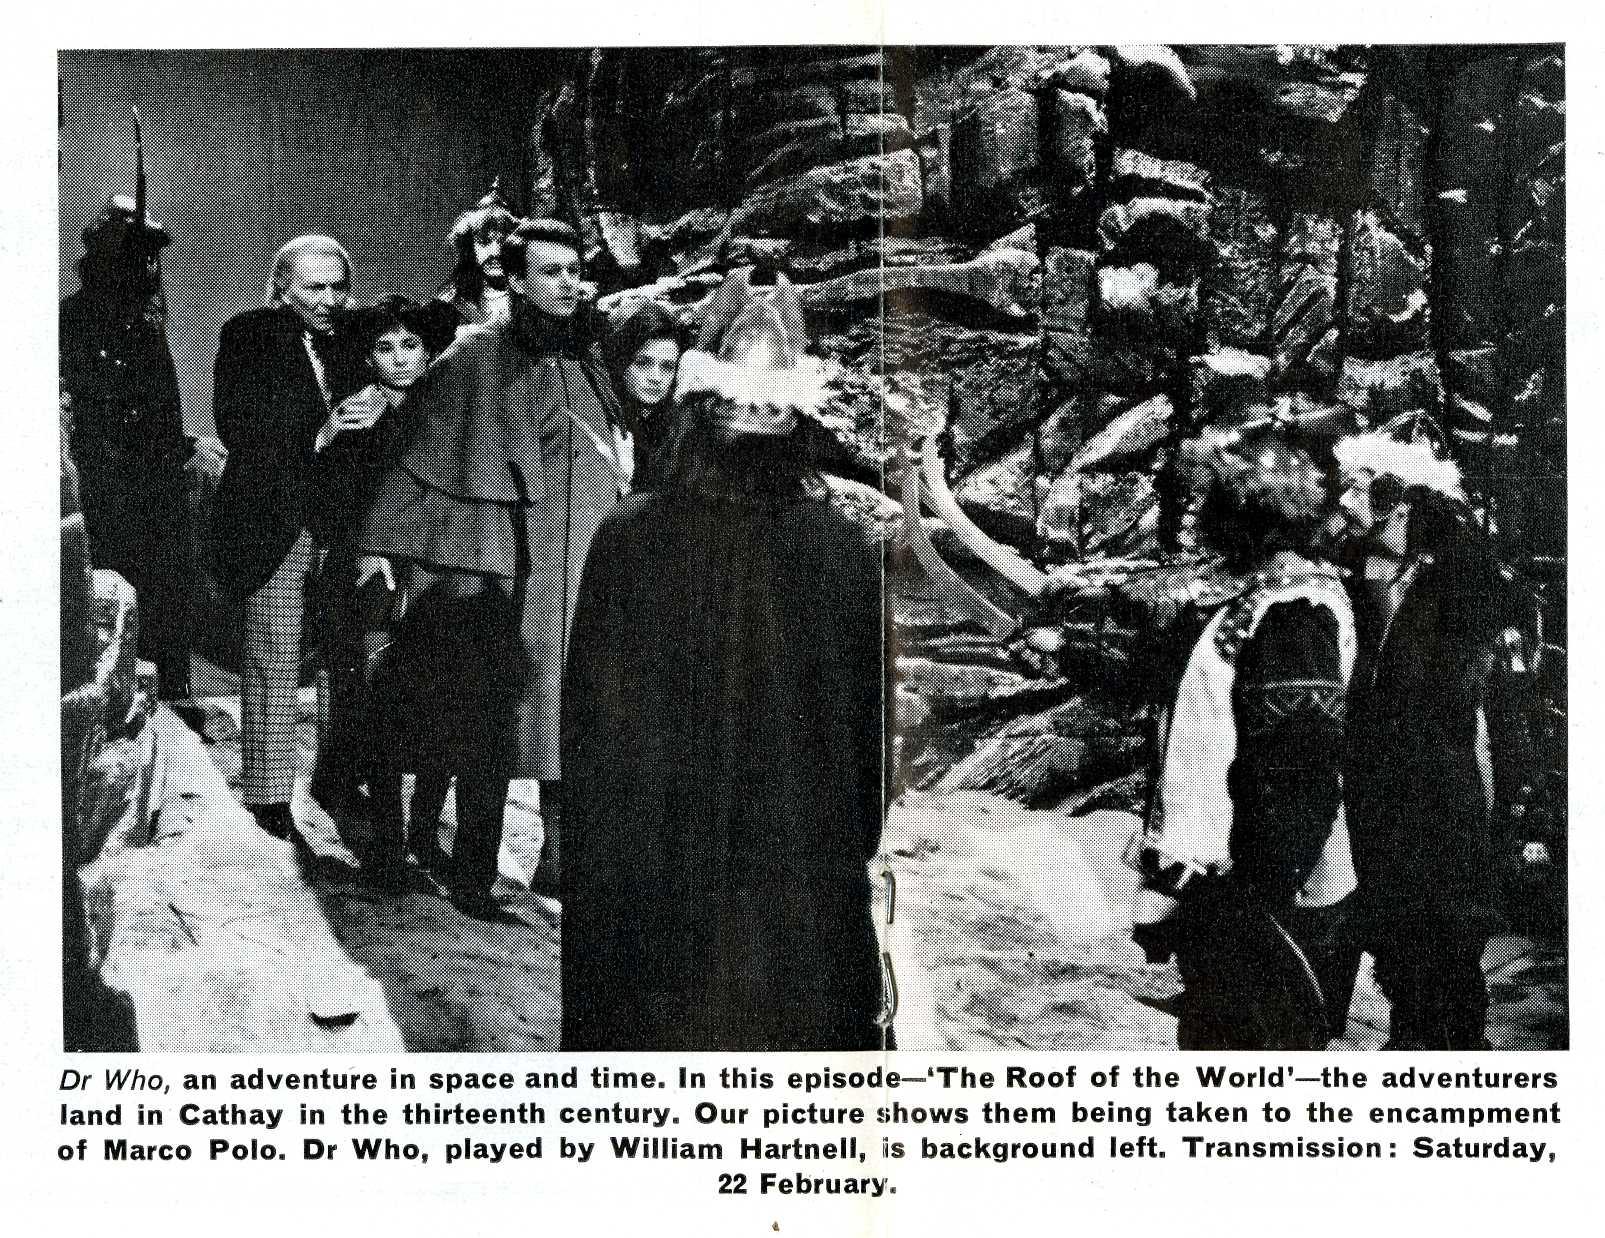 Ariel, Marco Polo photograph, February 1964